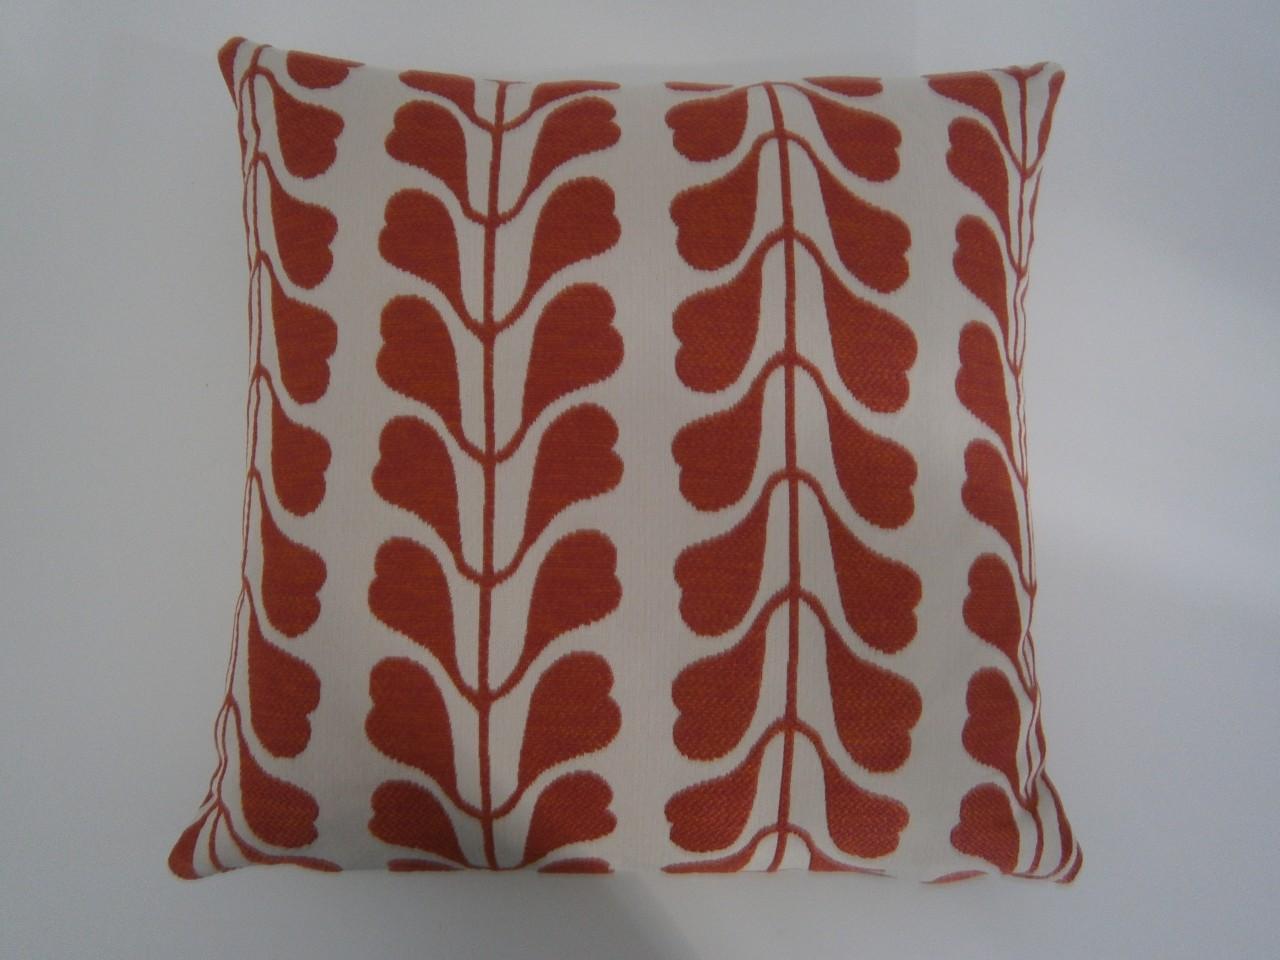 "Outdoor Cushion Covers 16"" Handmade Osborne & Little"